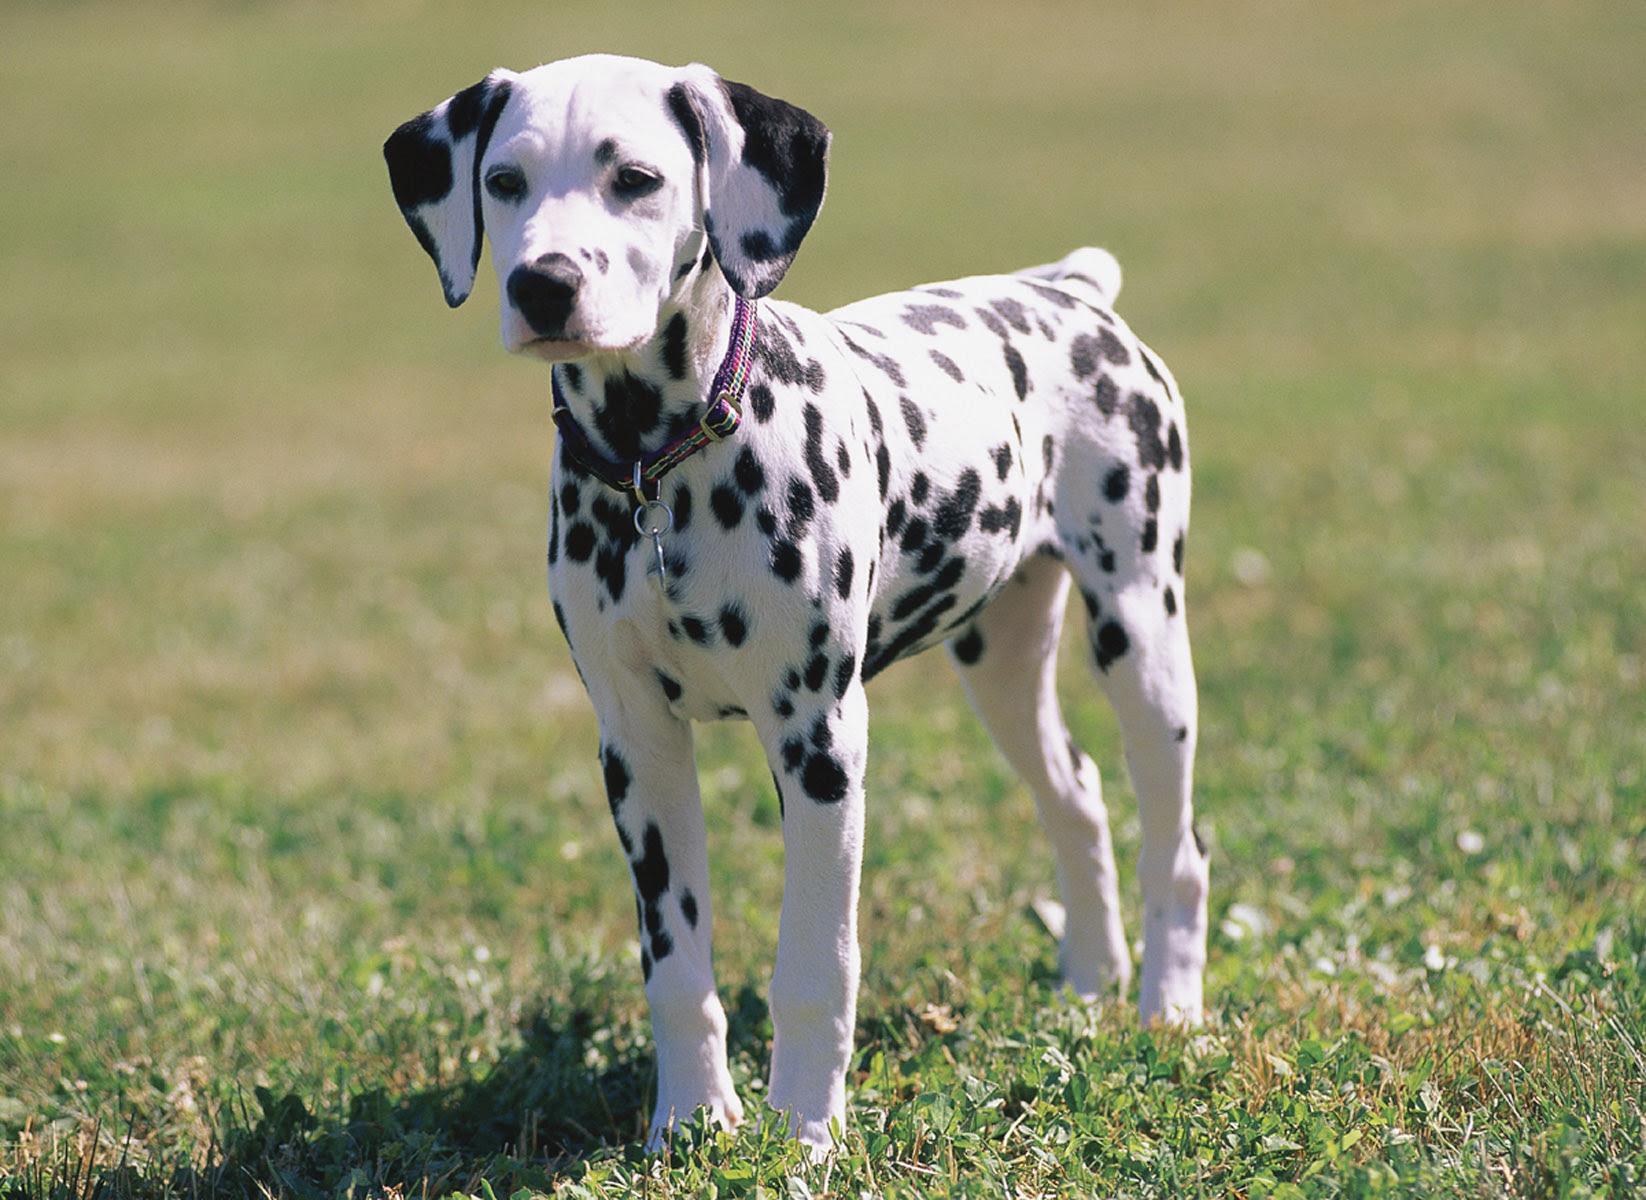 Dalmatian Funny Dogs